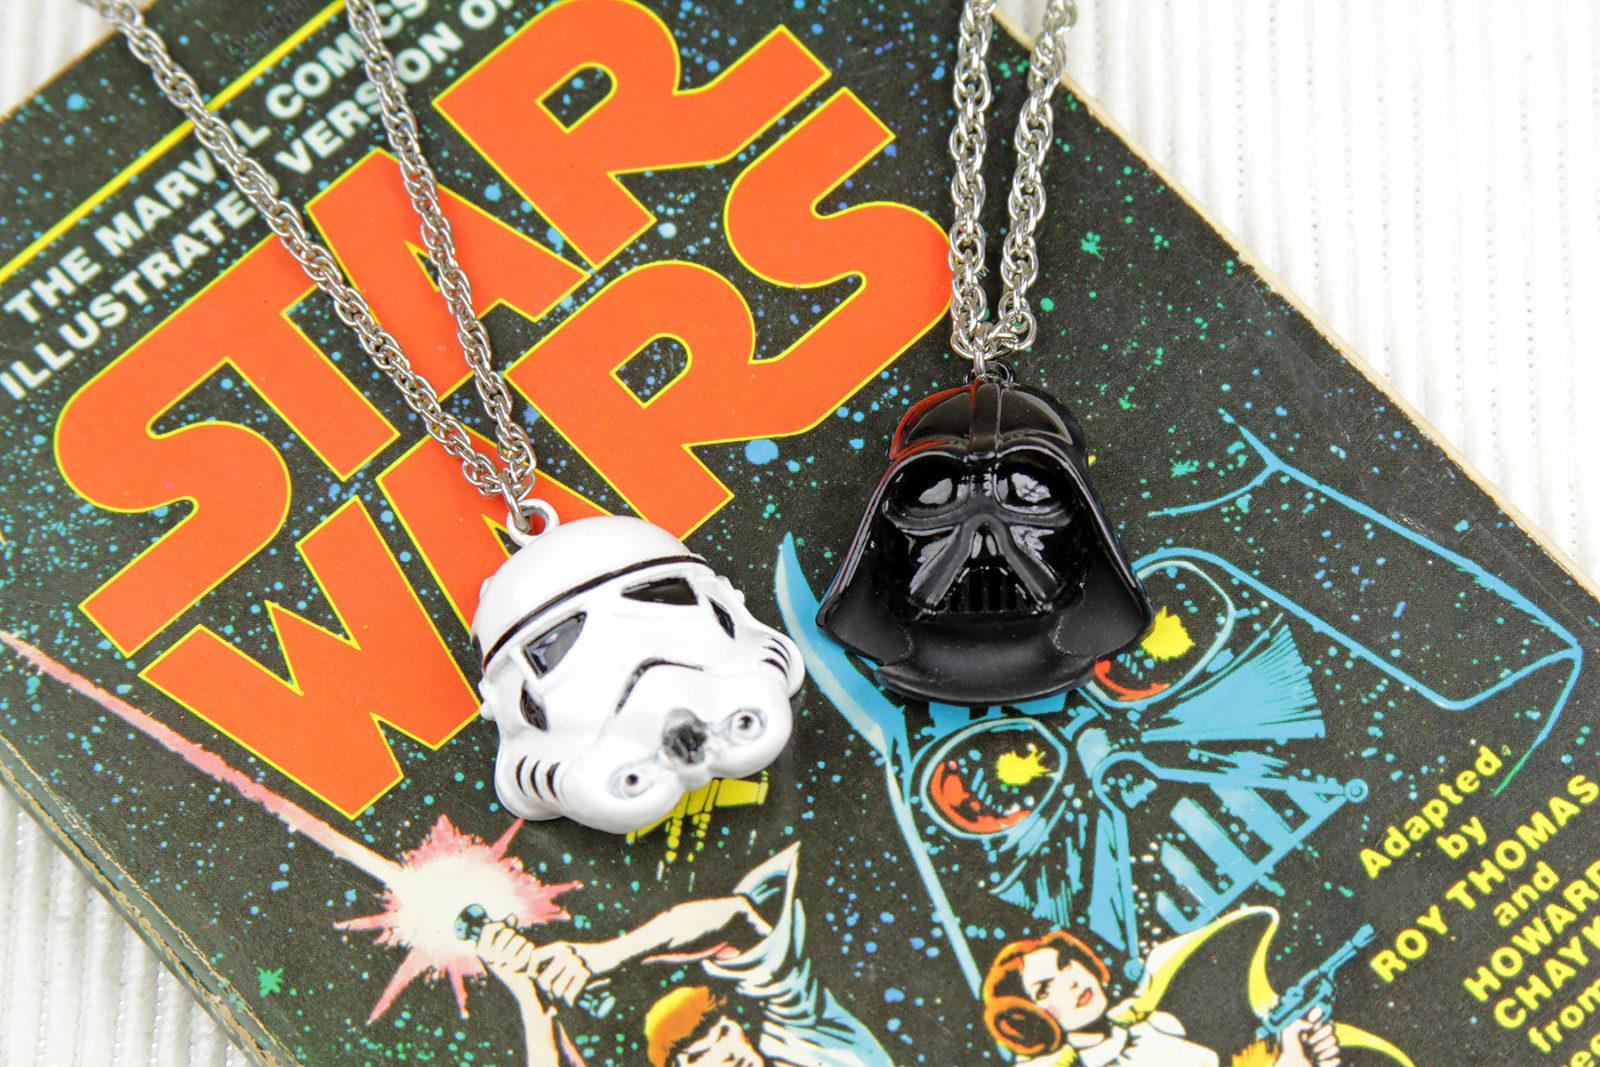 Star Wars 1977 Weingeroff Stormtrooper and Darth Vader necklaces